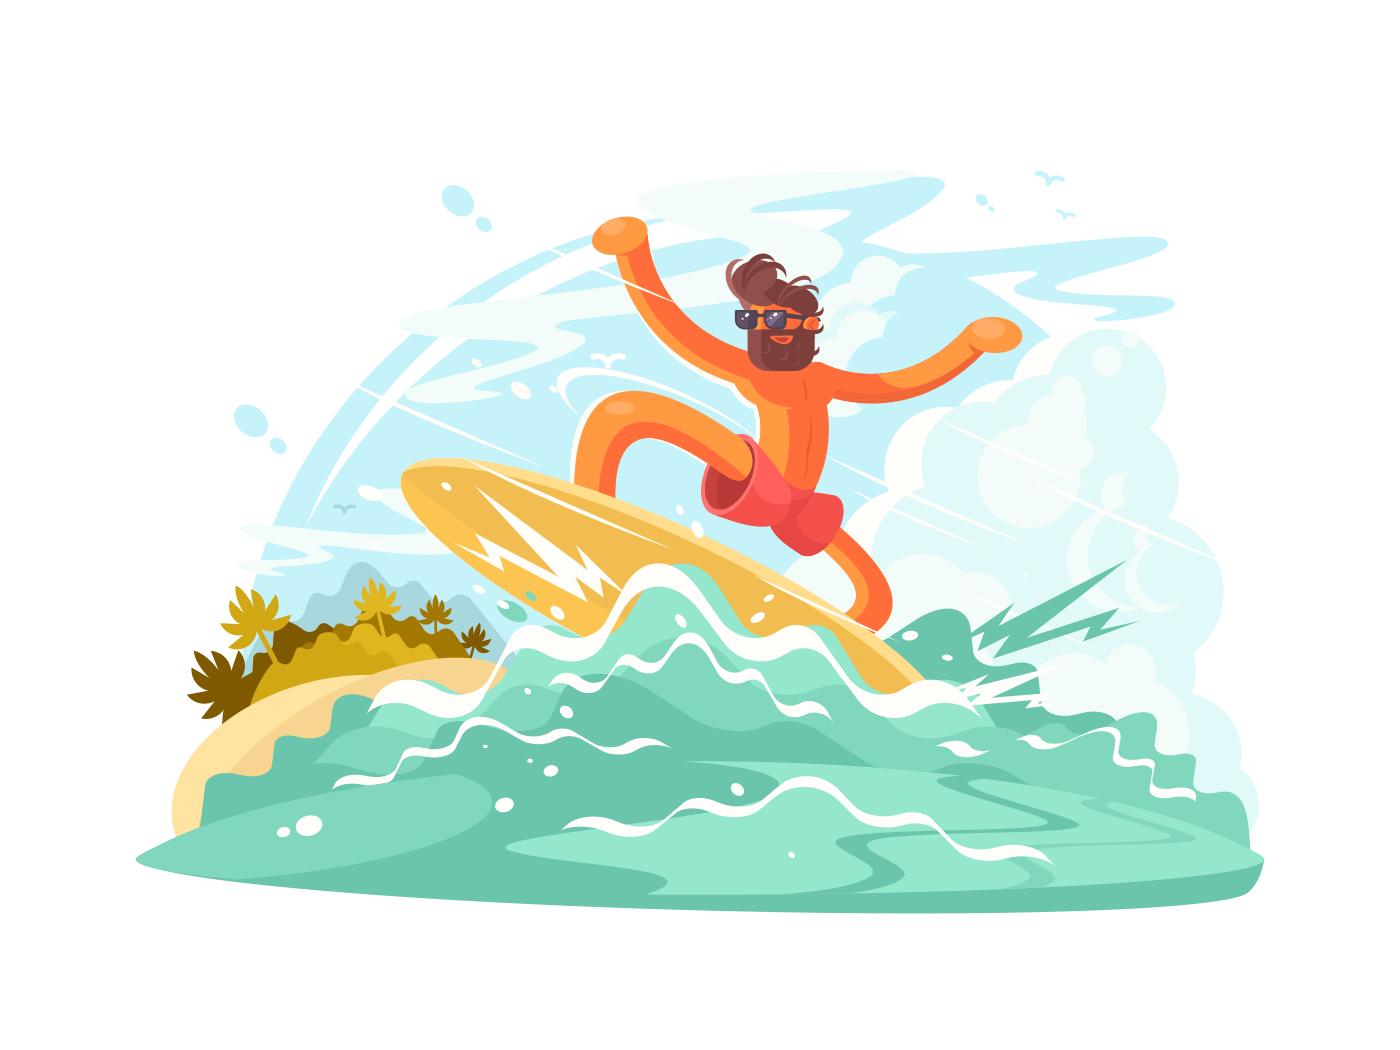 Surfer guy in sunglass illustration